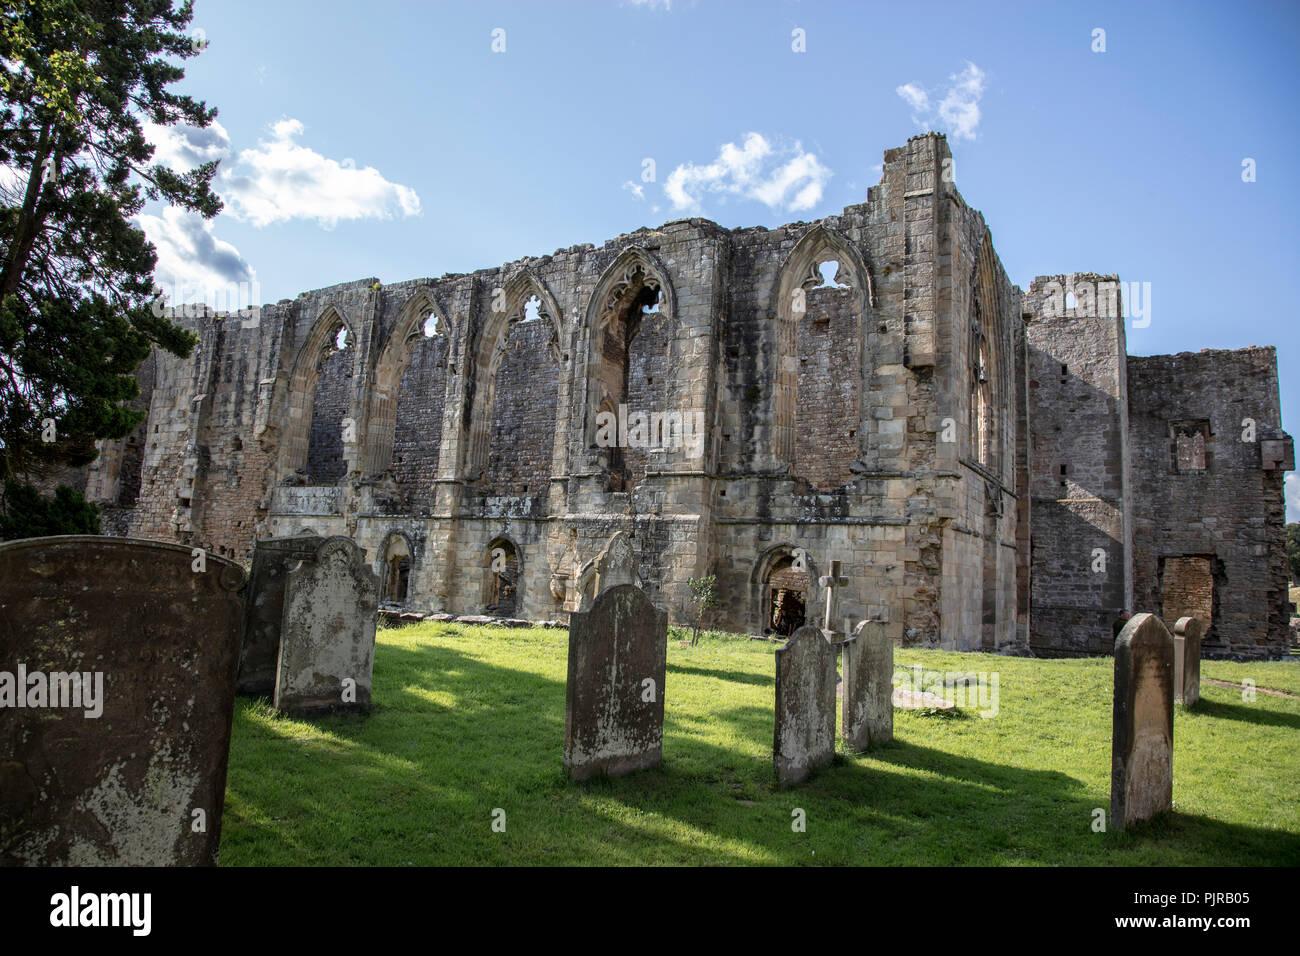 Easby Abbey near Richmond, Yorkshire - Stock Image